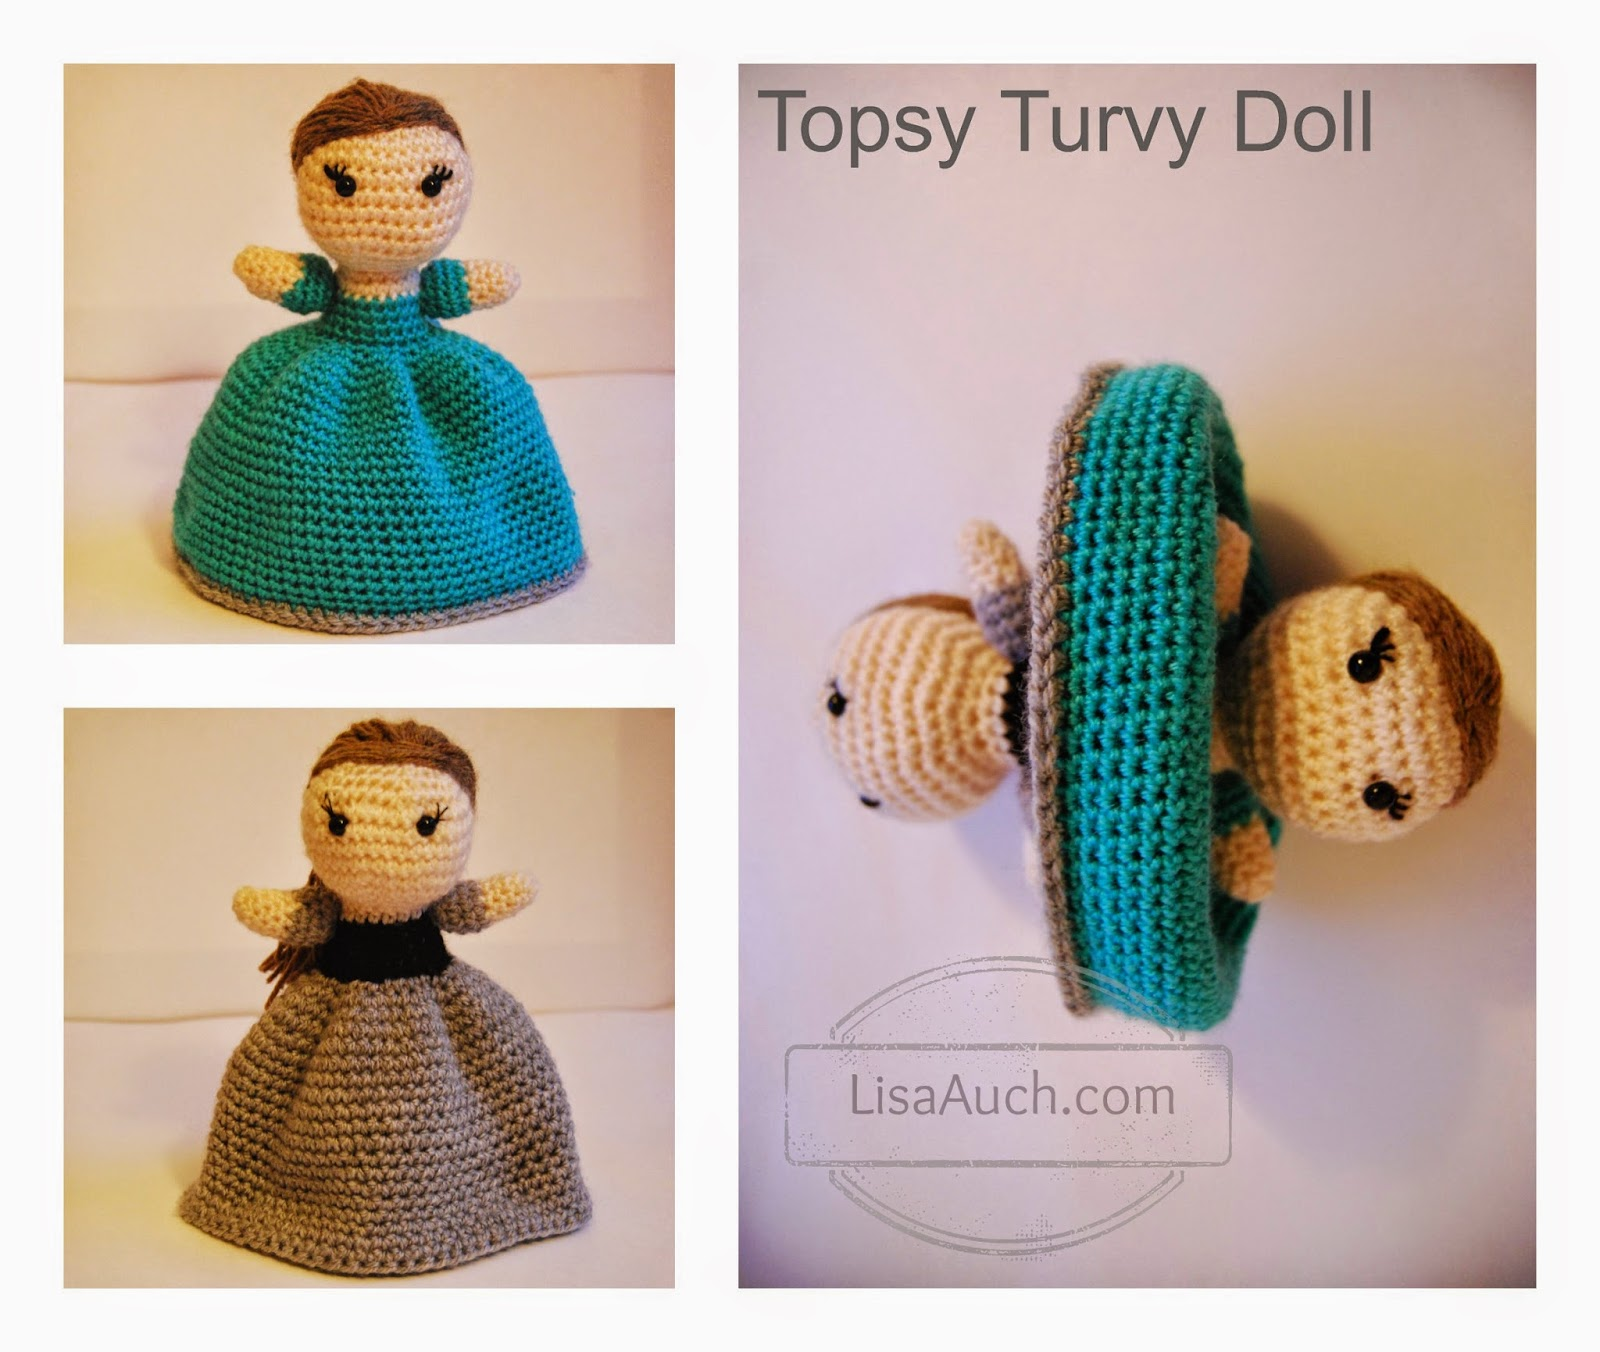 free topsy turvy crochet doll pattern